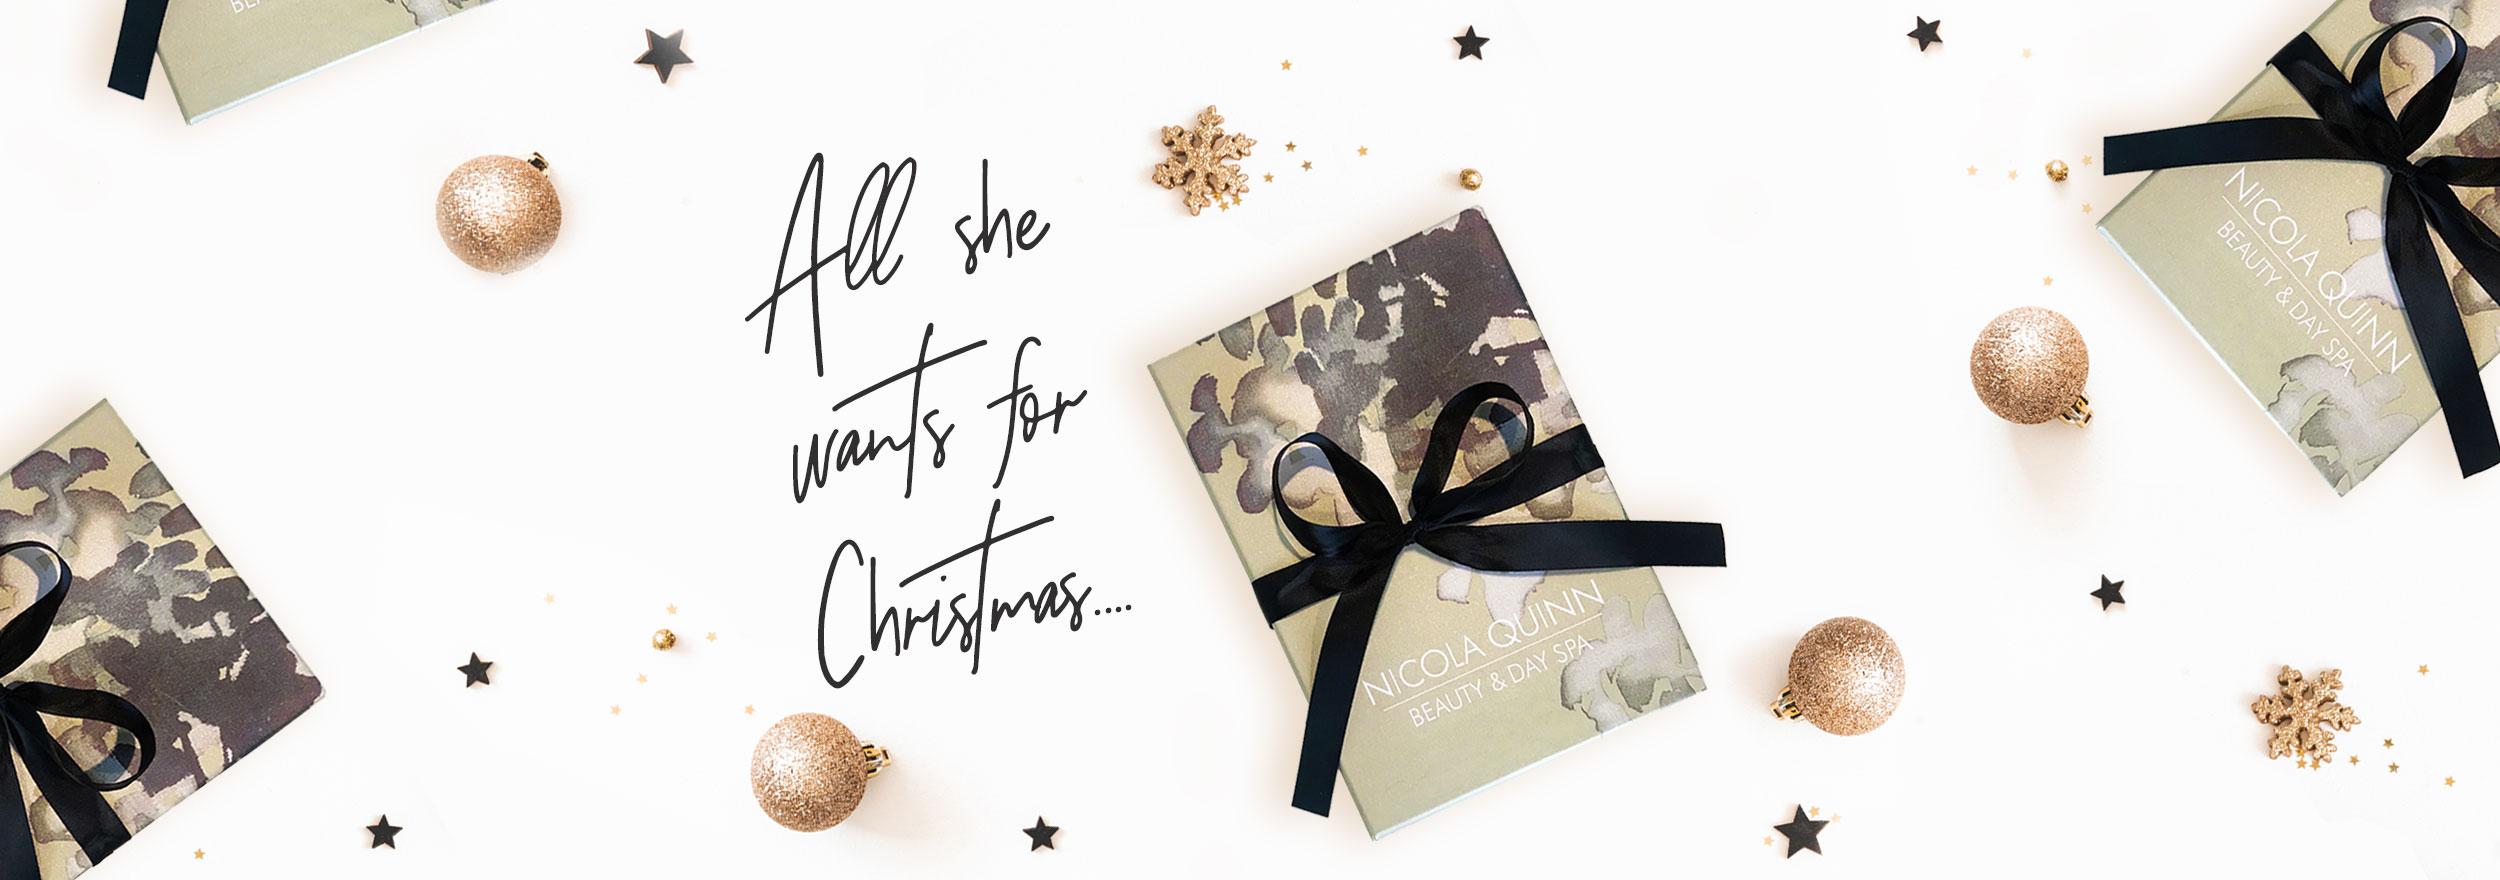 nicola quinn spa gift voucher